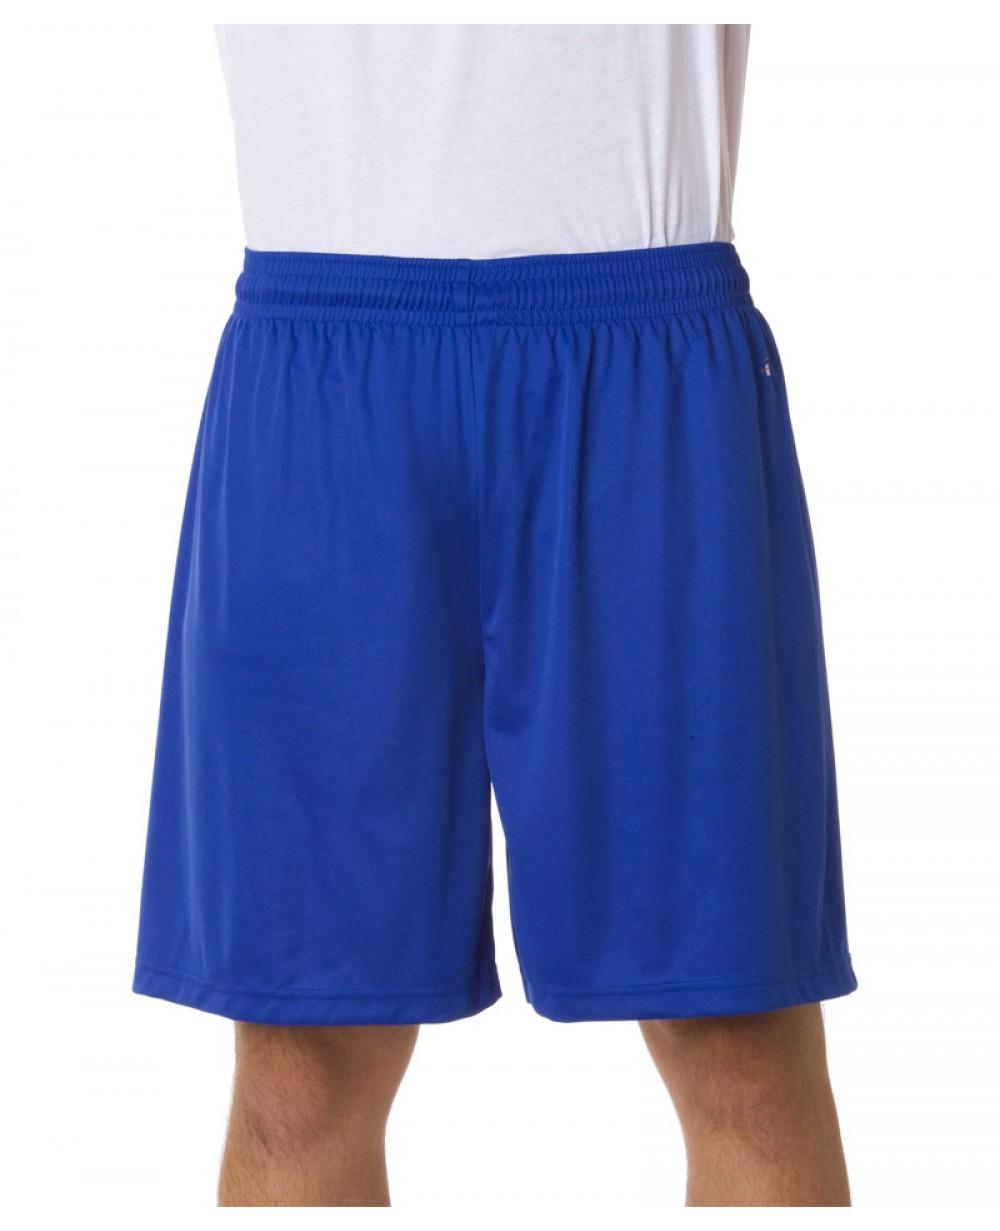 Royal Blue Athletic Shorts